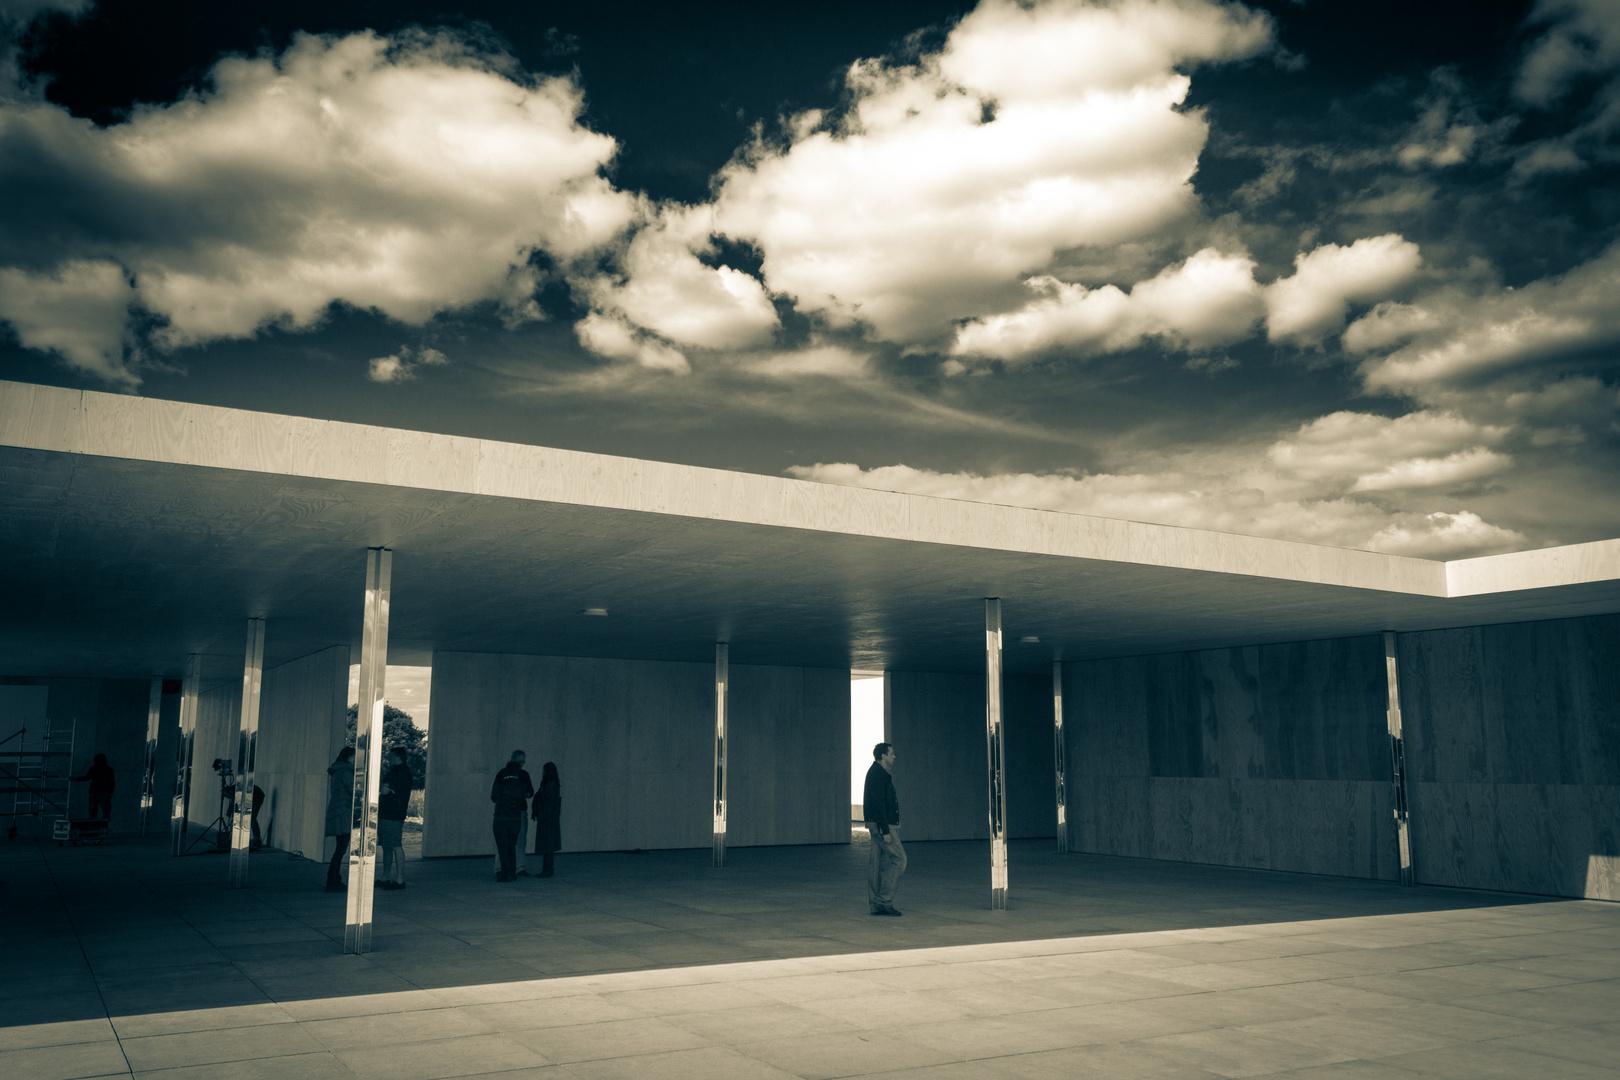 mies van der rohe das golfclub projekt krefeld egelsberg 02 foto bild architektur. Black Bedroom Furniture Sets. Home Design Ideas